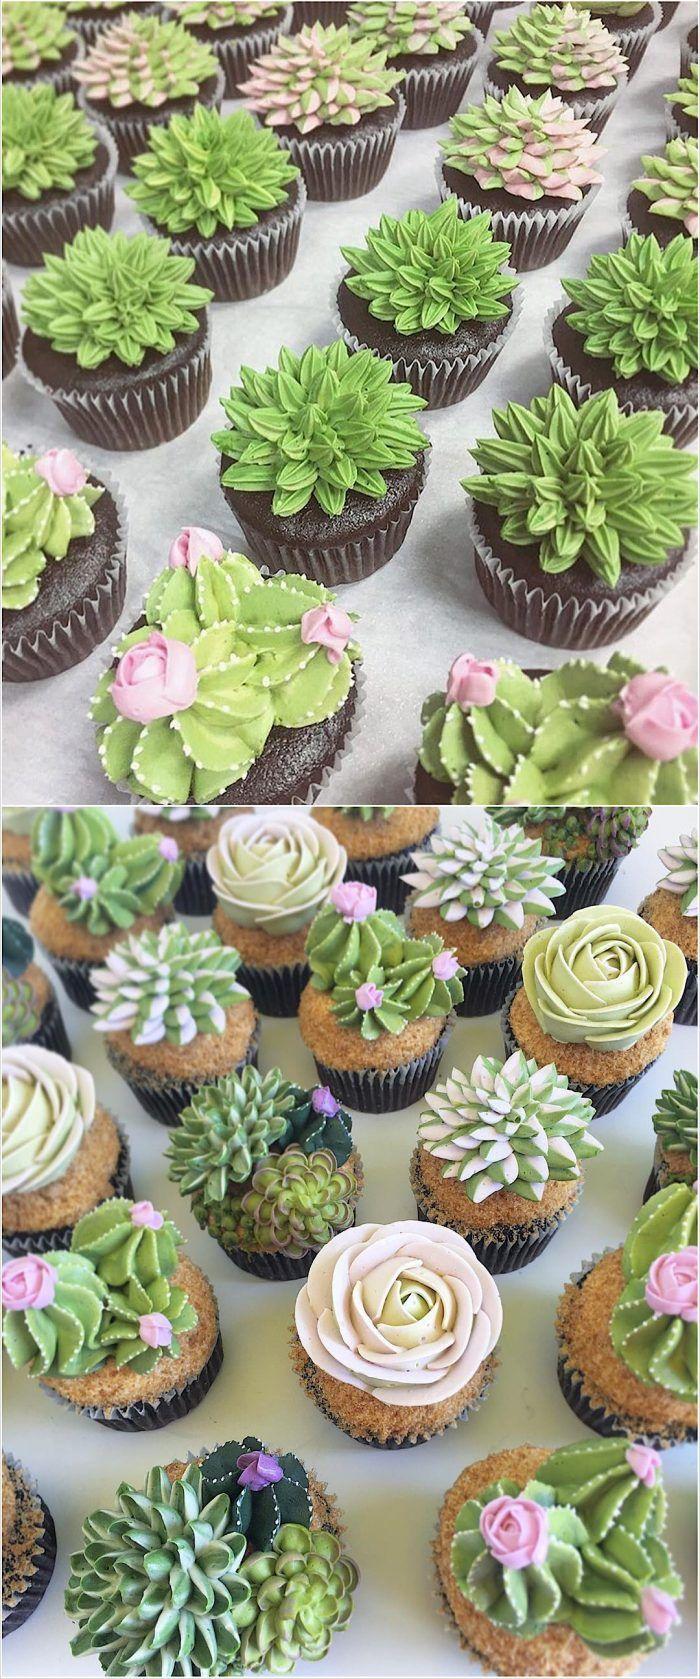 ❇️ Succulent Icing Cupcake Arrangements